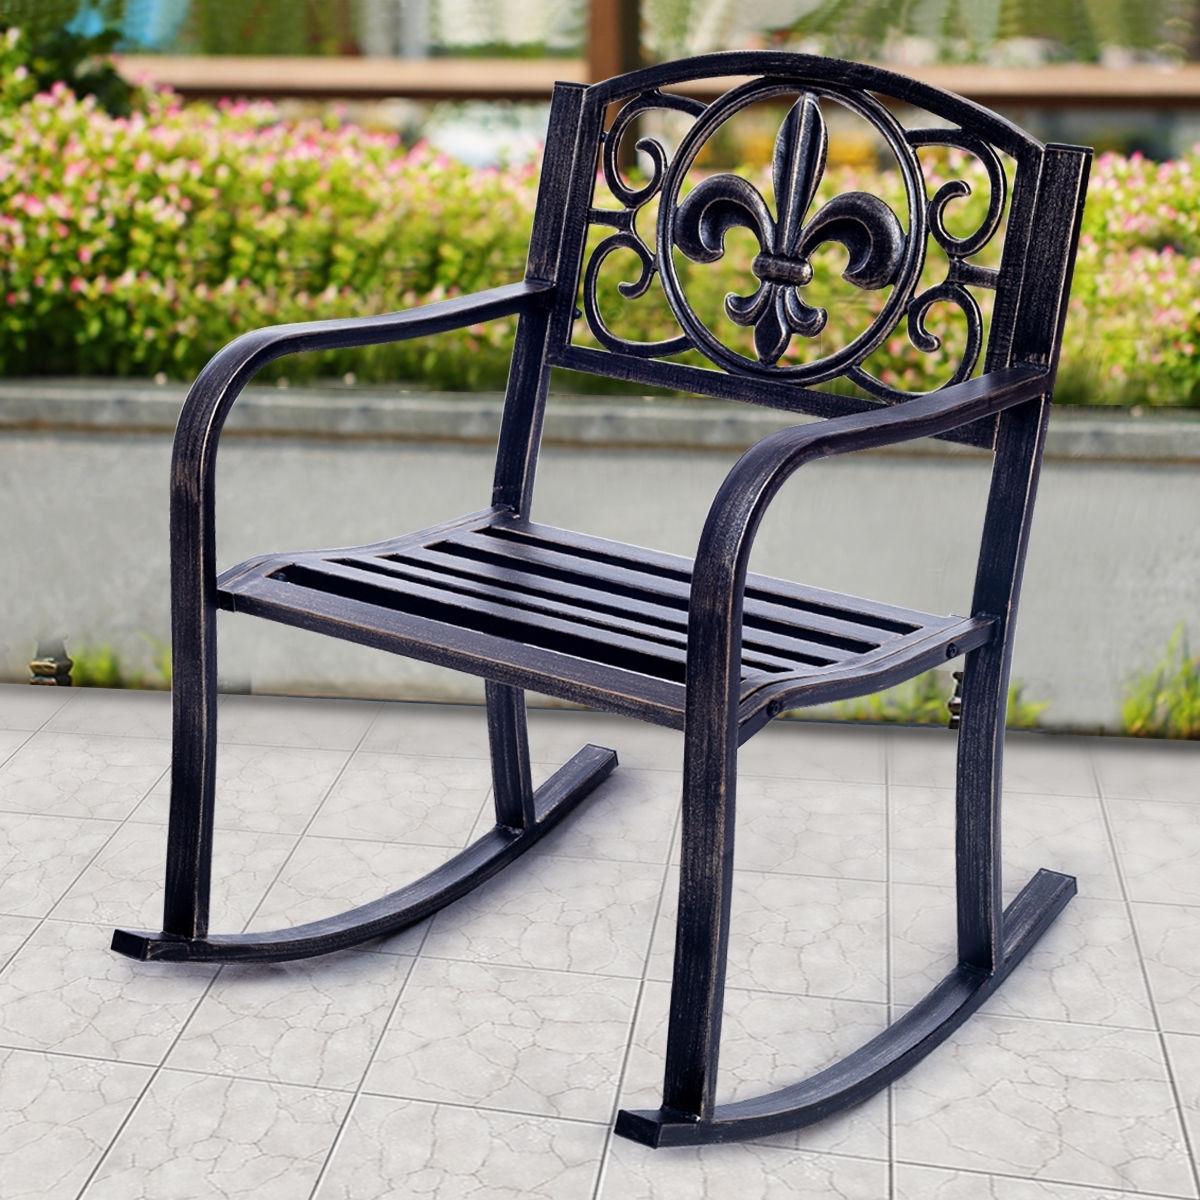 Costway: Costway Patio Metal Rocking Chair Porch Seat Deck Outdoor In 2018 Patio Metal Rocking Chairs (View 4 of 15)